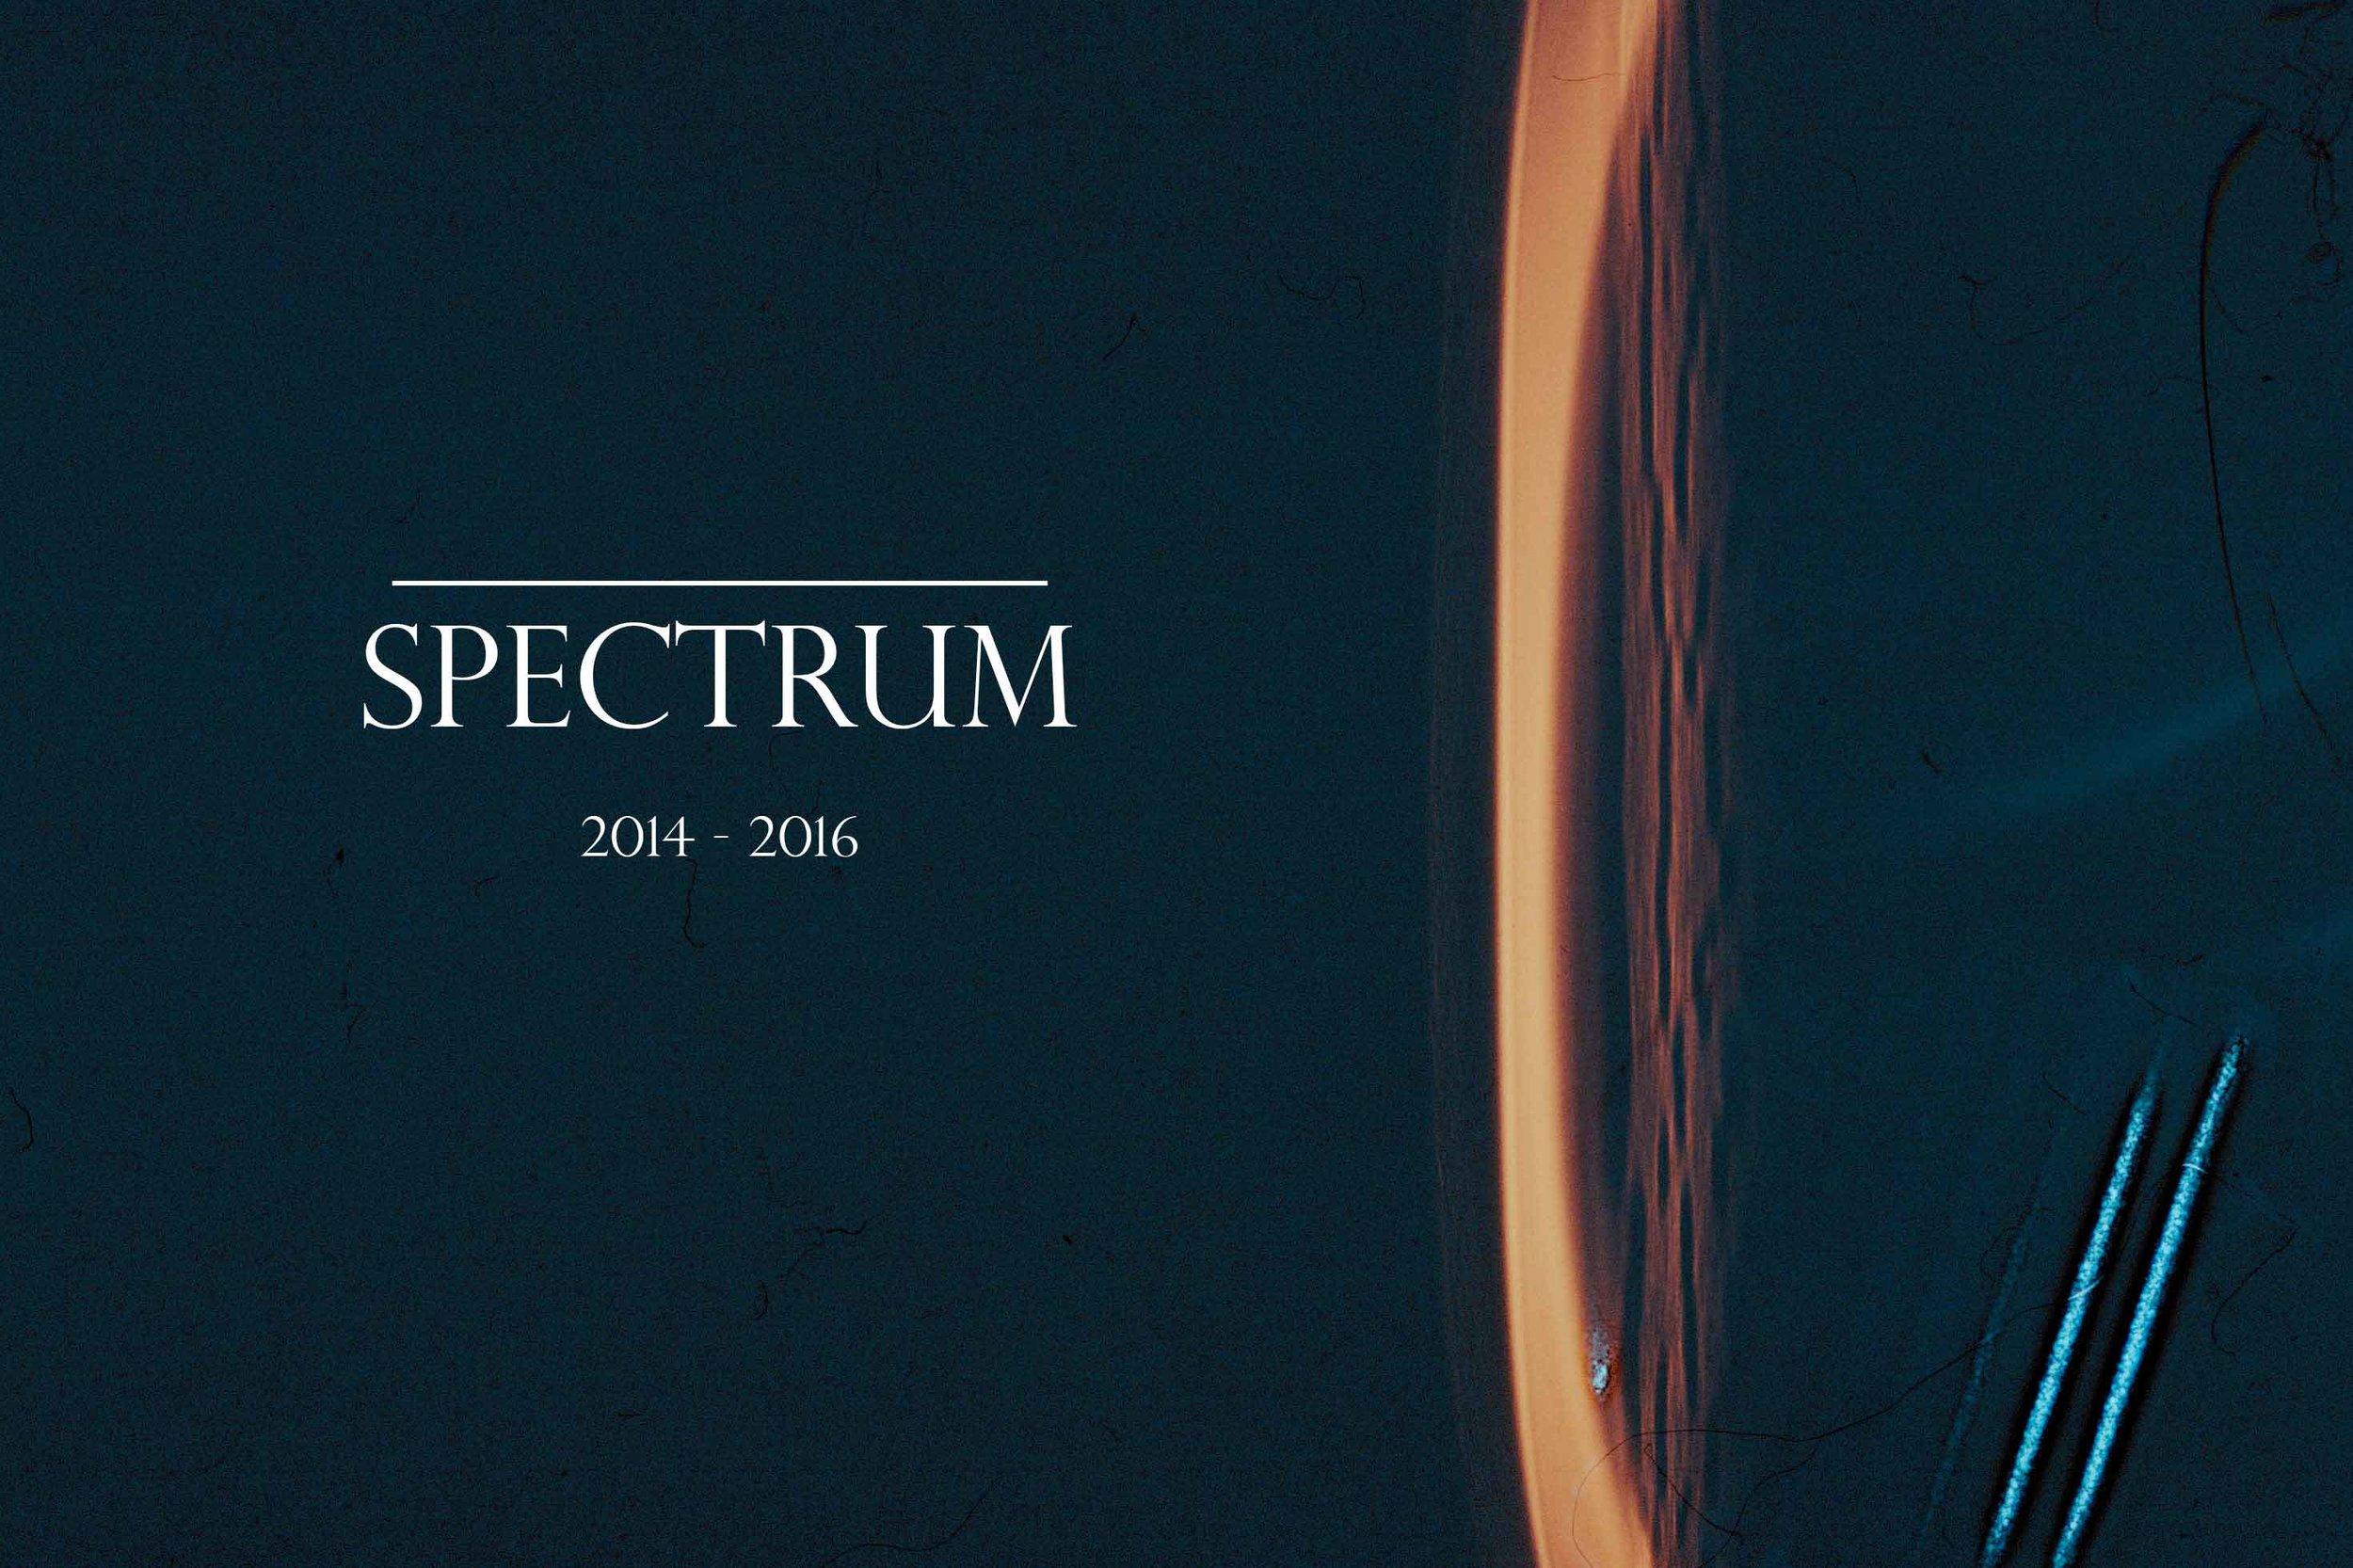 Spectrum_01.jpg